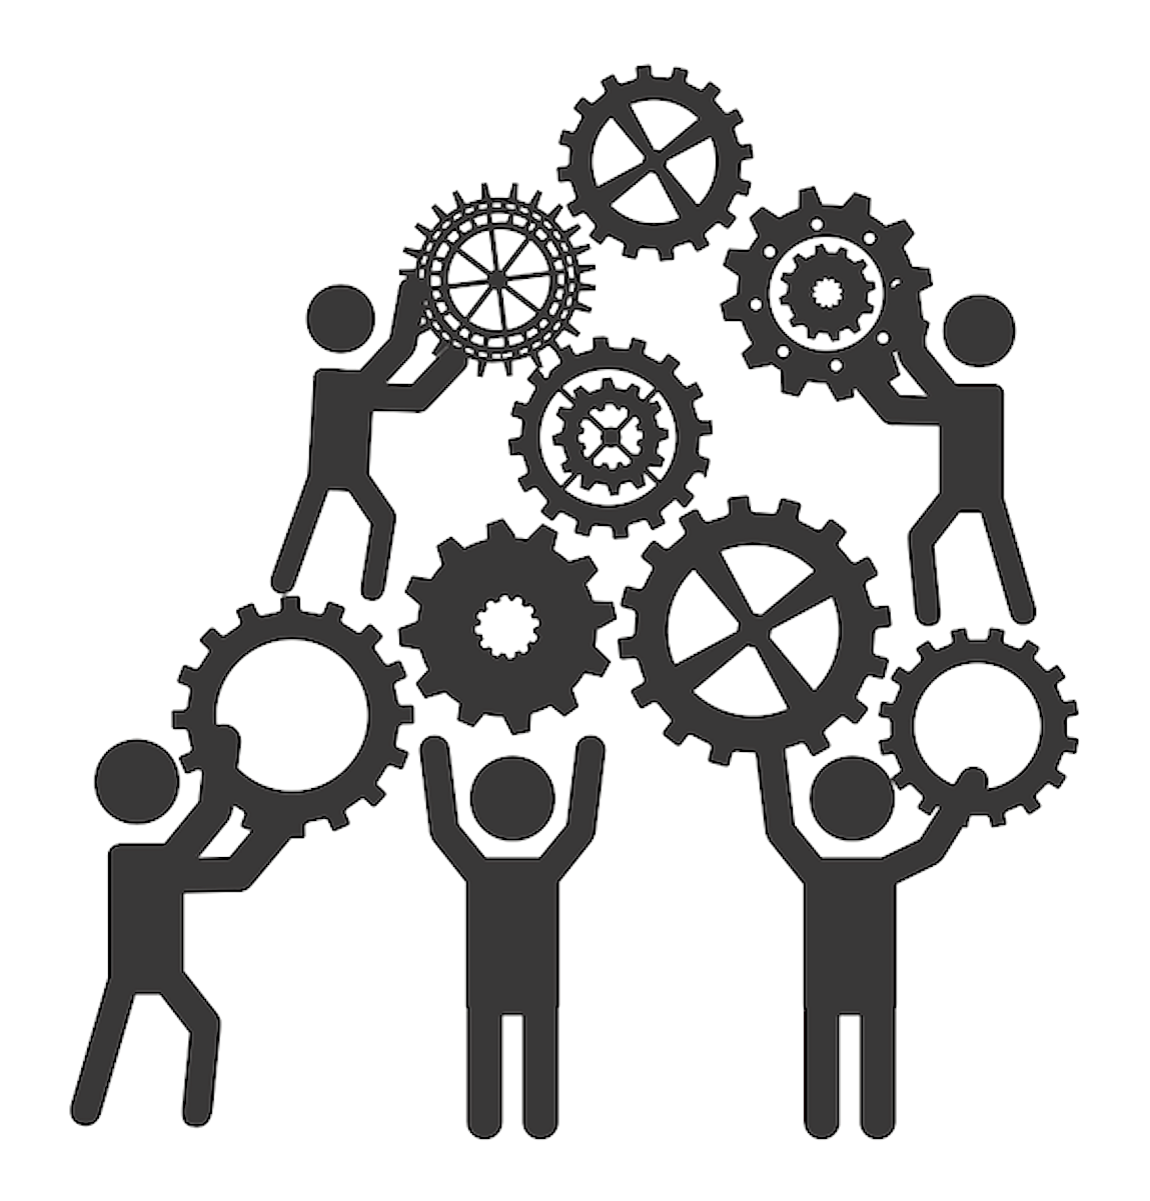 Companii pasive, reactive si proactive